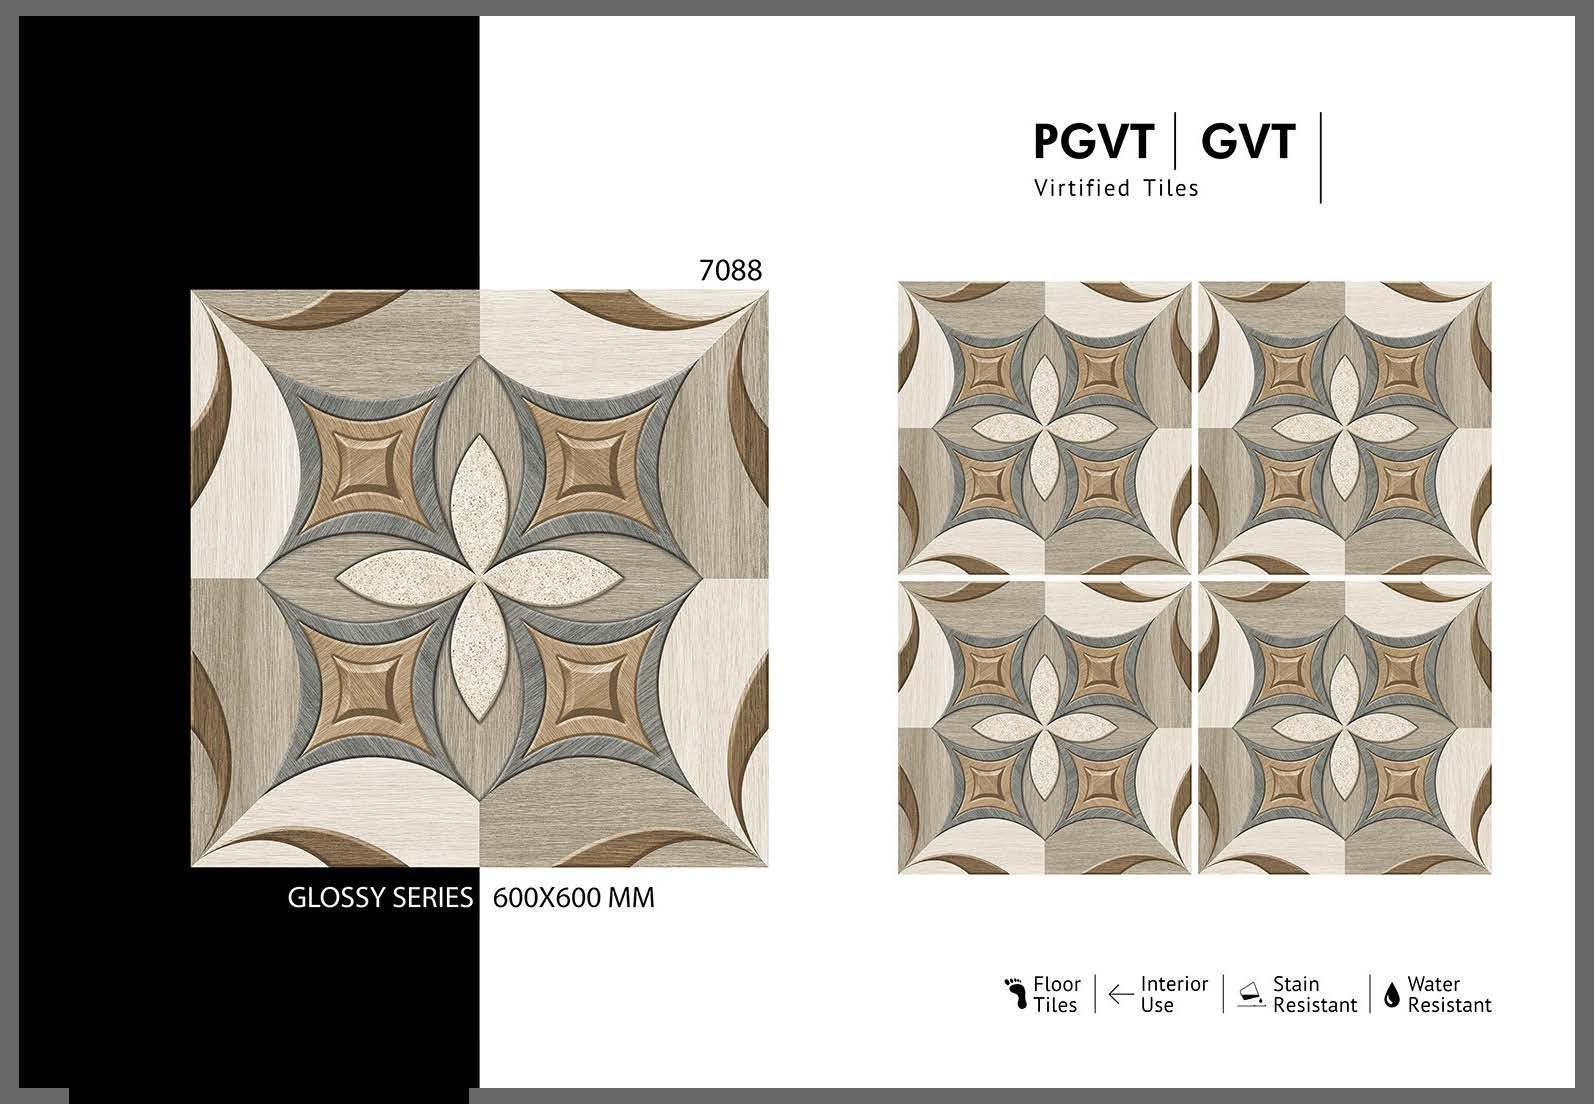 GVT 2X2 GLOSSY_Page_75.jpg